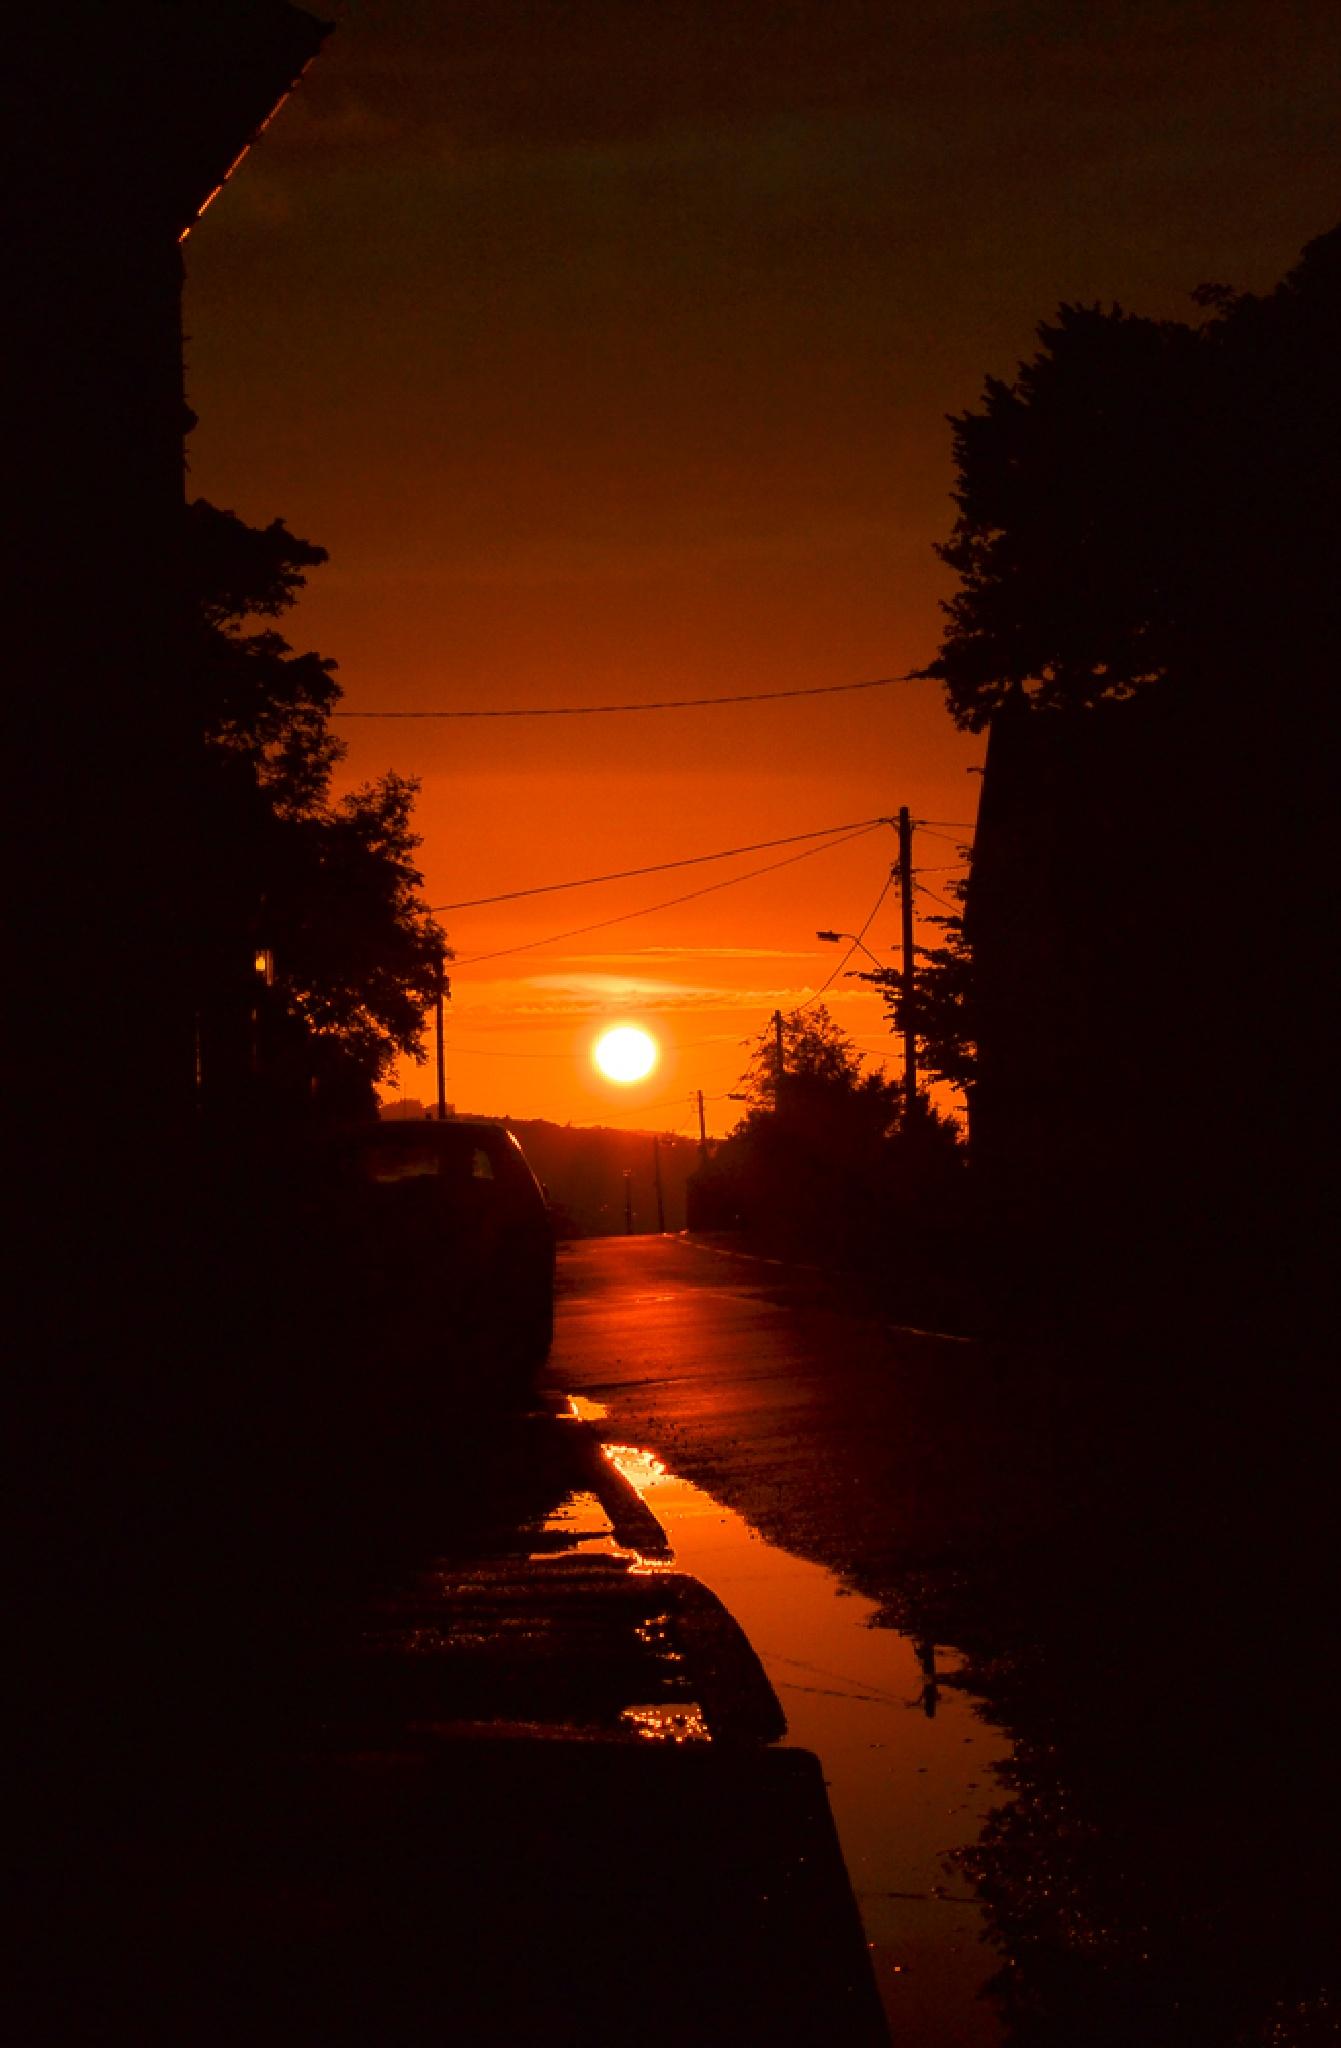 A Fiery Sunset by Nicky Molyneux